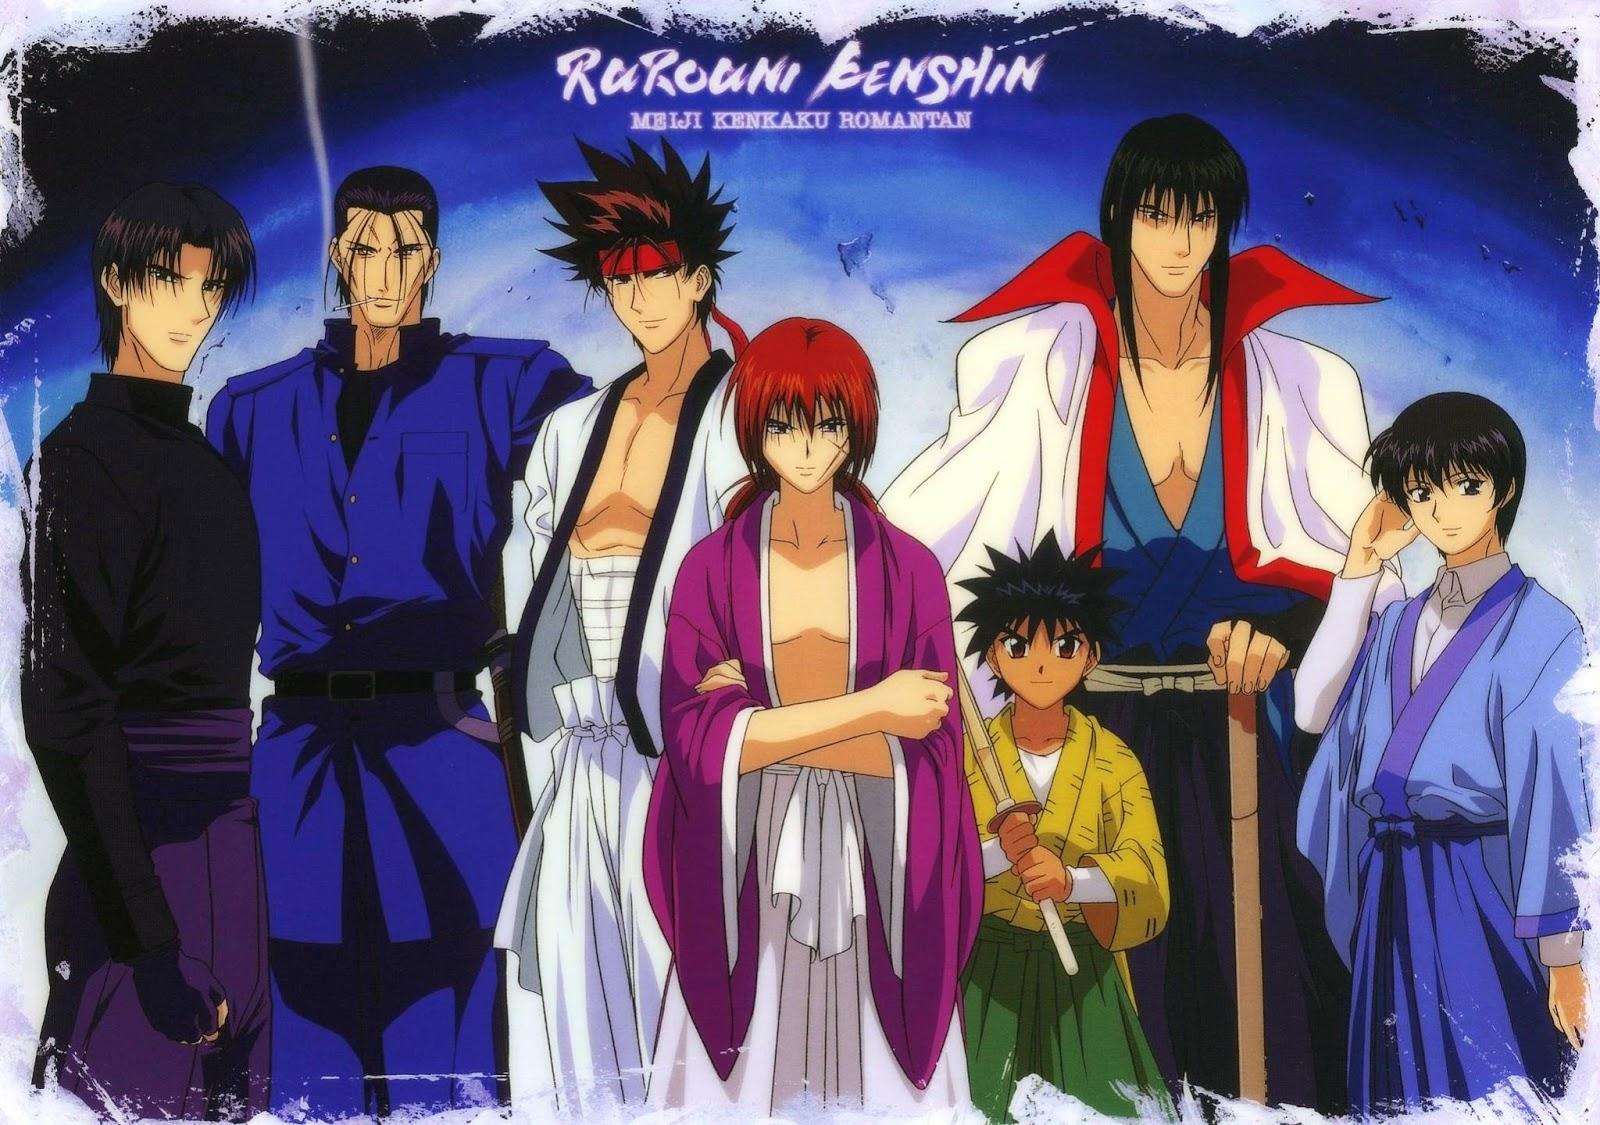 Rurouni Kenshin ซามไรพเนจร ภาค 1 3 ภาคพเศษ จบ พากยไทย